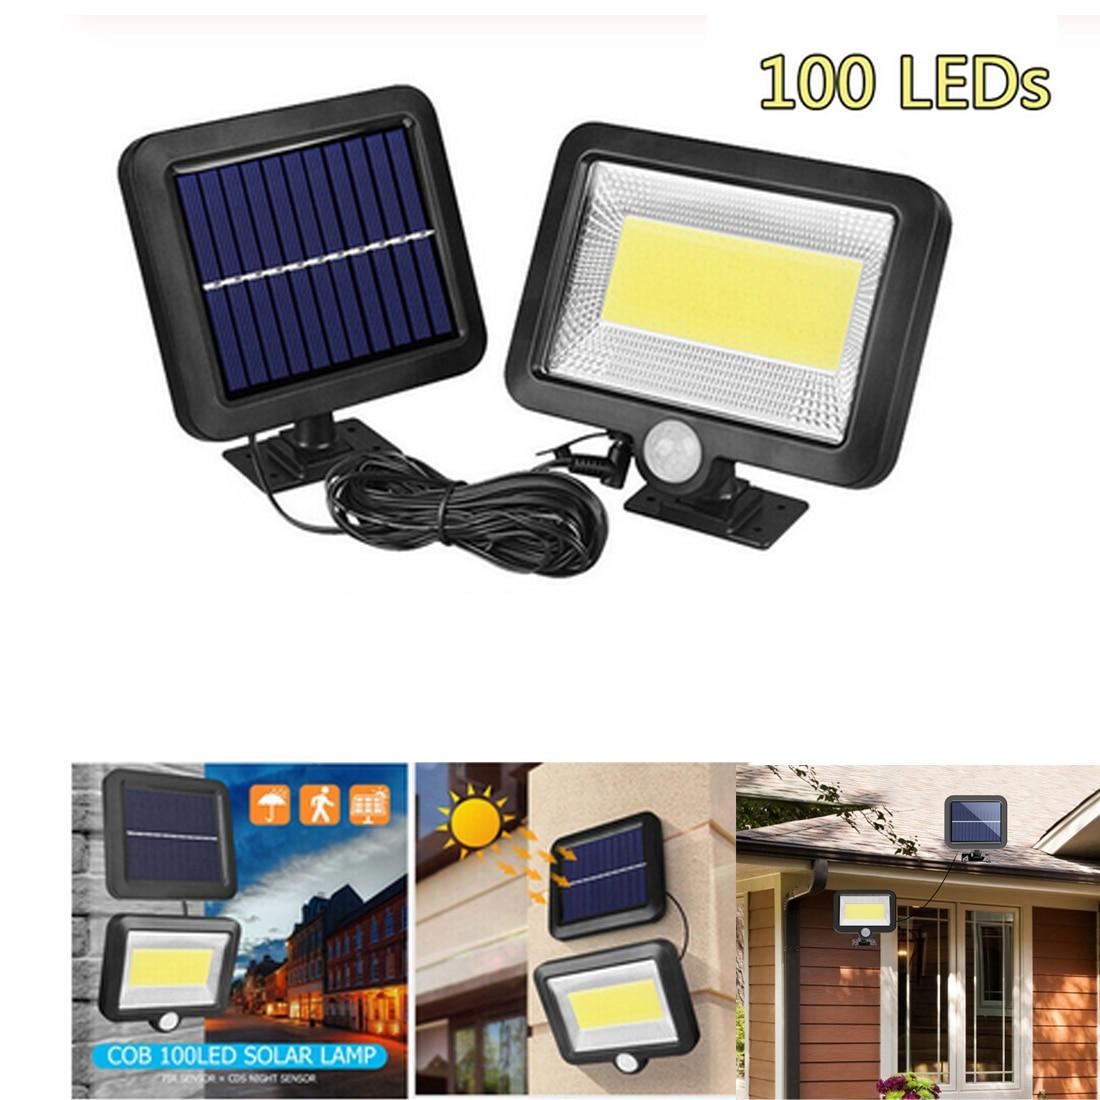 COB 56/100LED Solar Lamp Motion Sensor Outdoor Path Support Outdoor Lighting Solar Light Sunlight